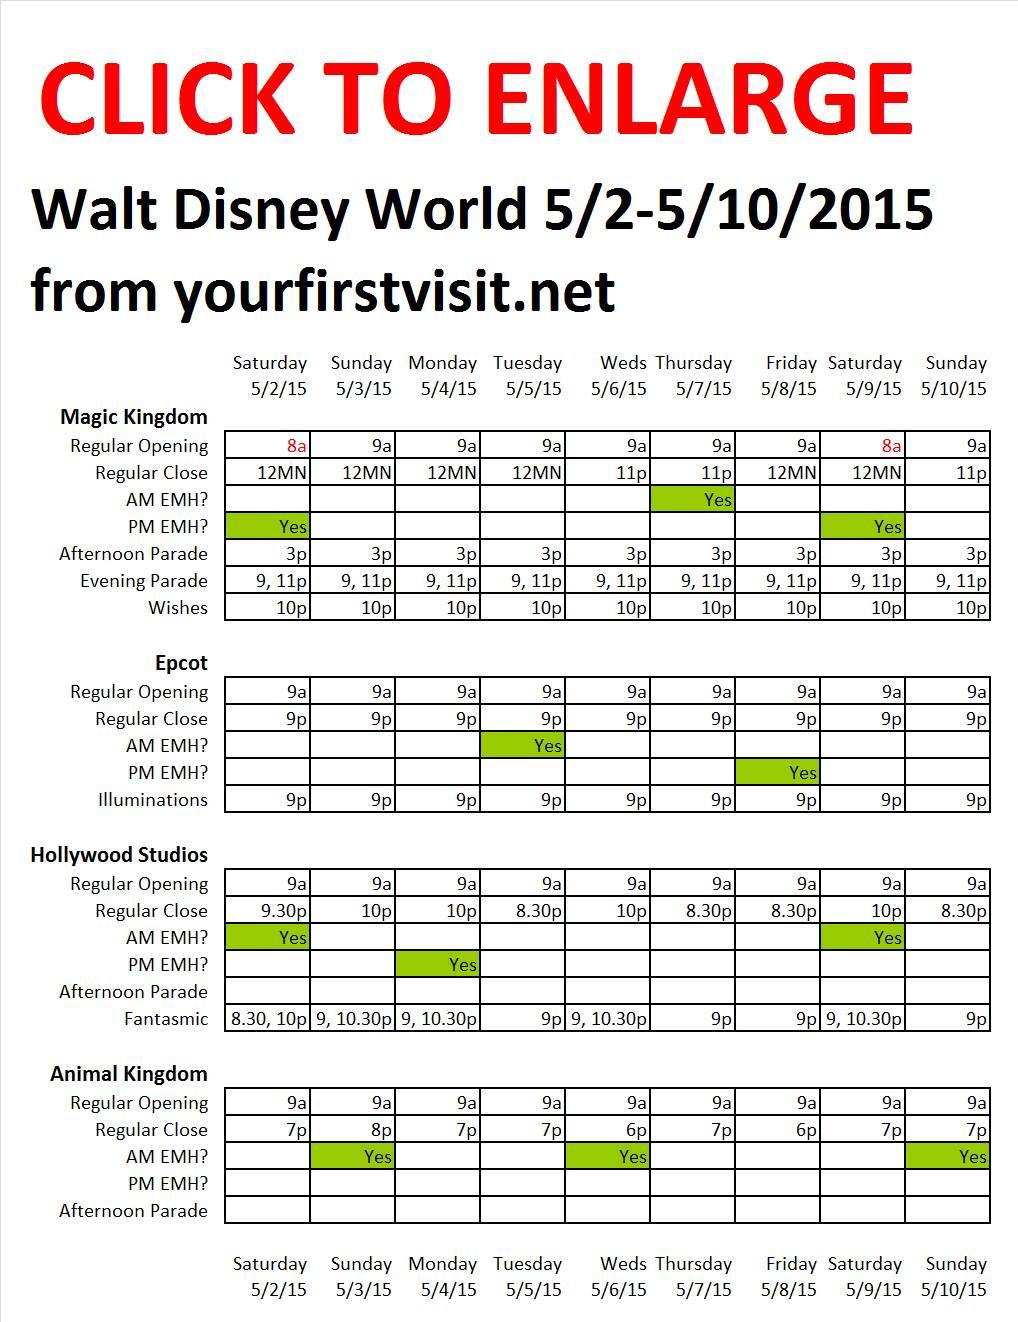 Disney World 5-2 to 5-10-2015 from yourfirstvisit.net